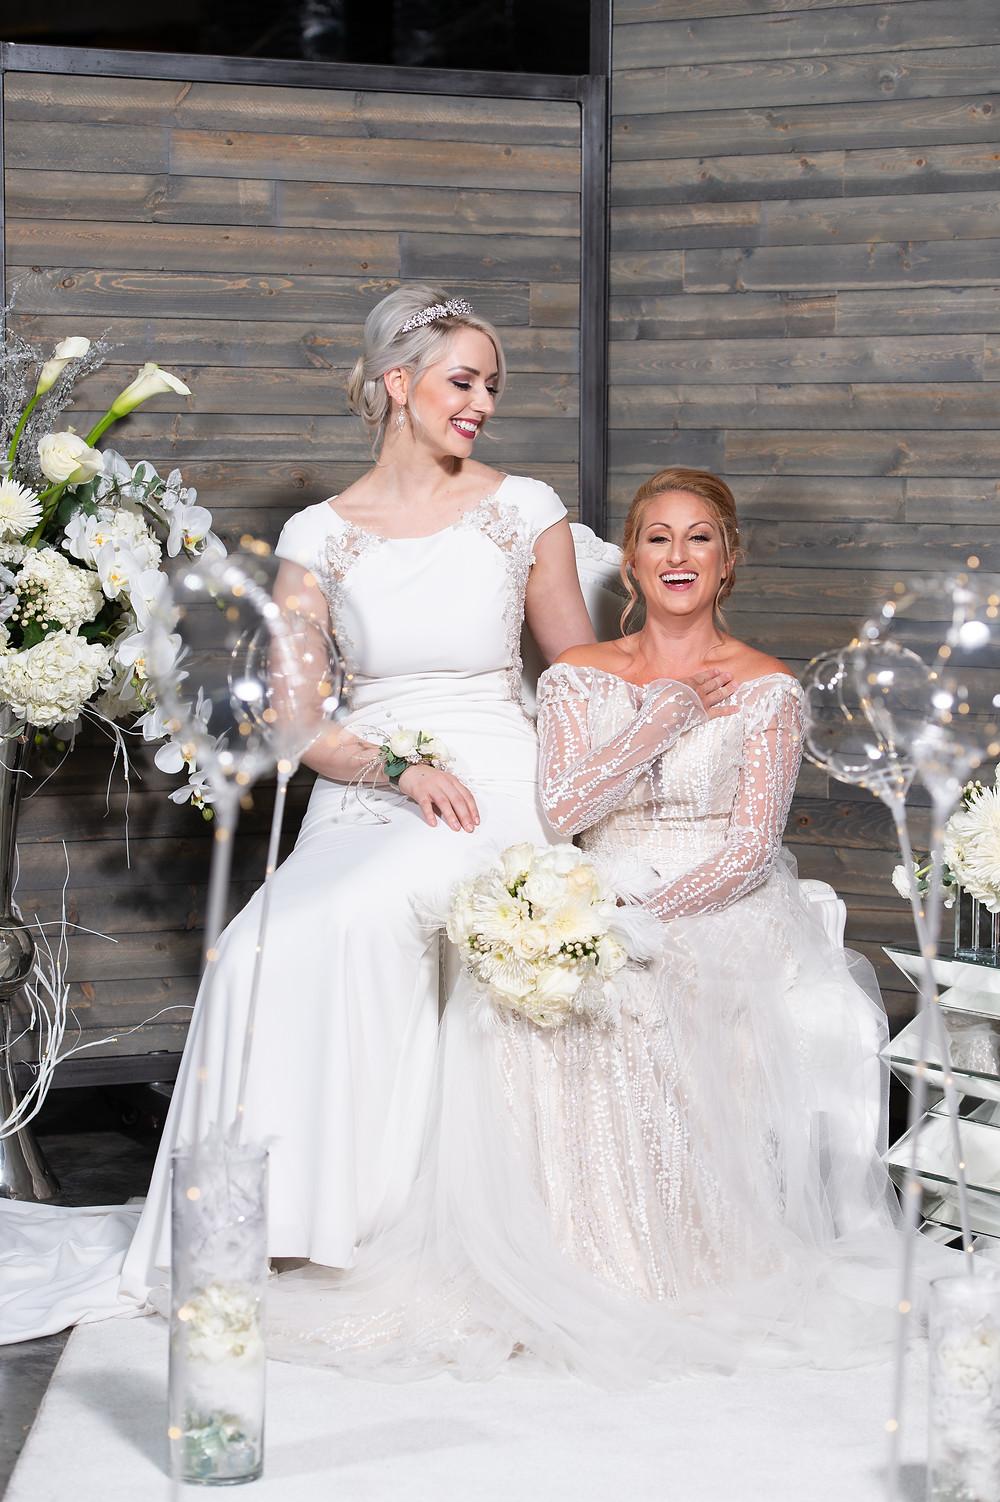 Models displaying wedding dresses amid wedding decor